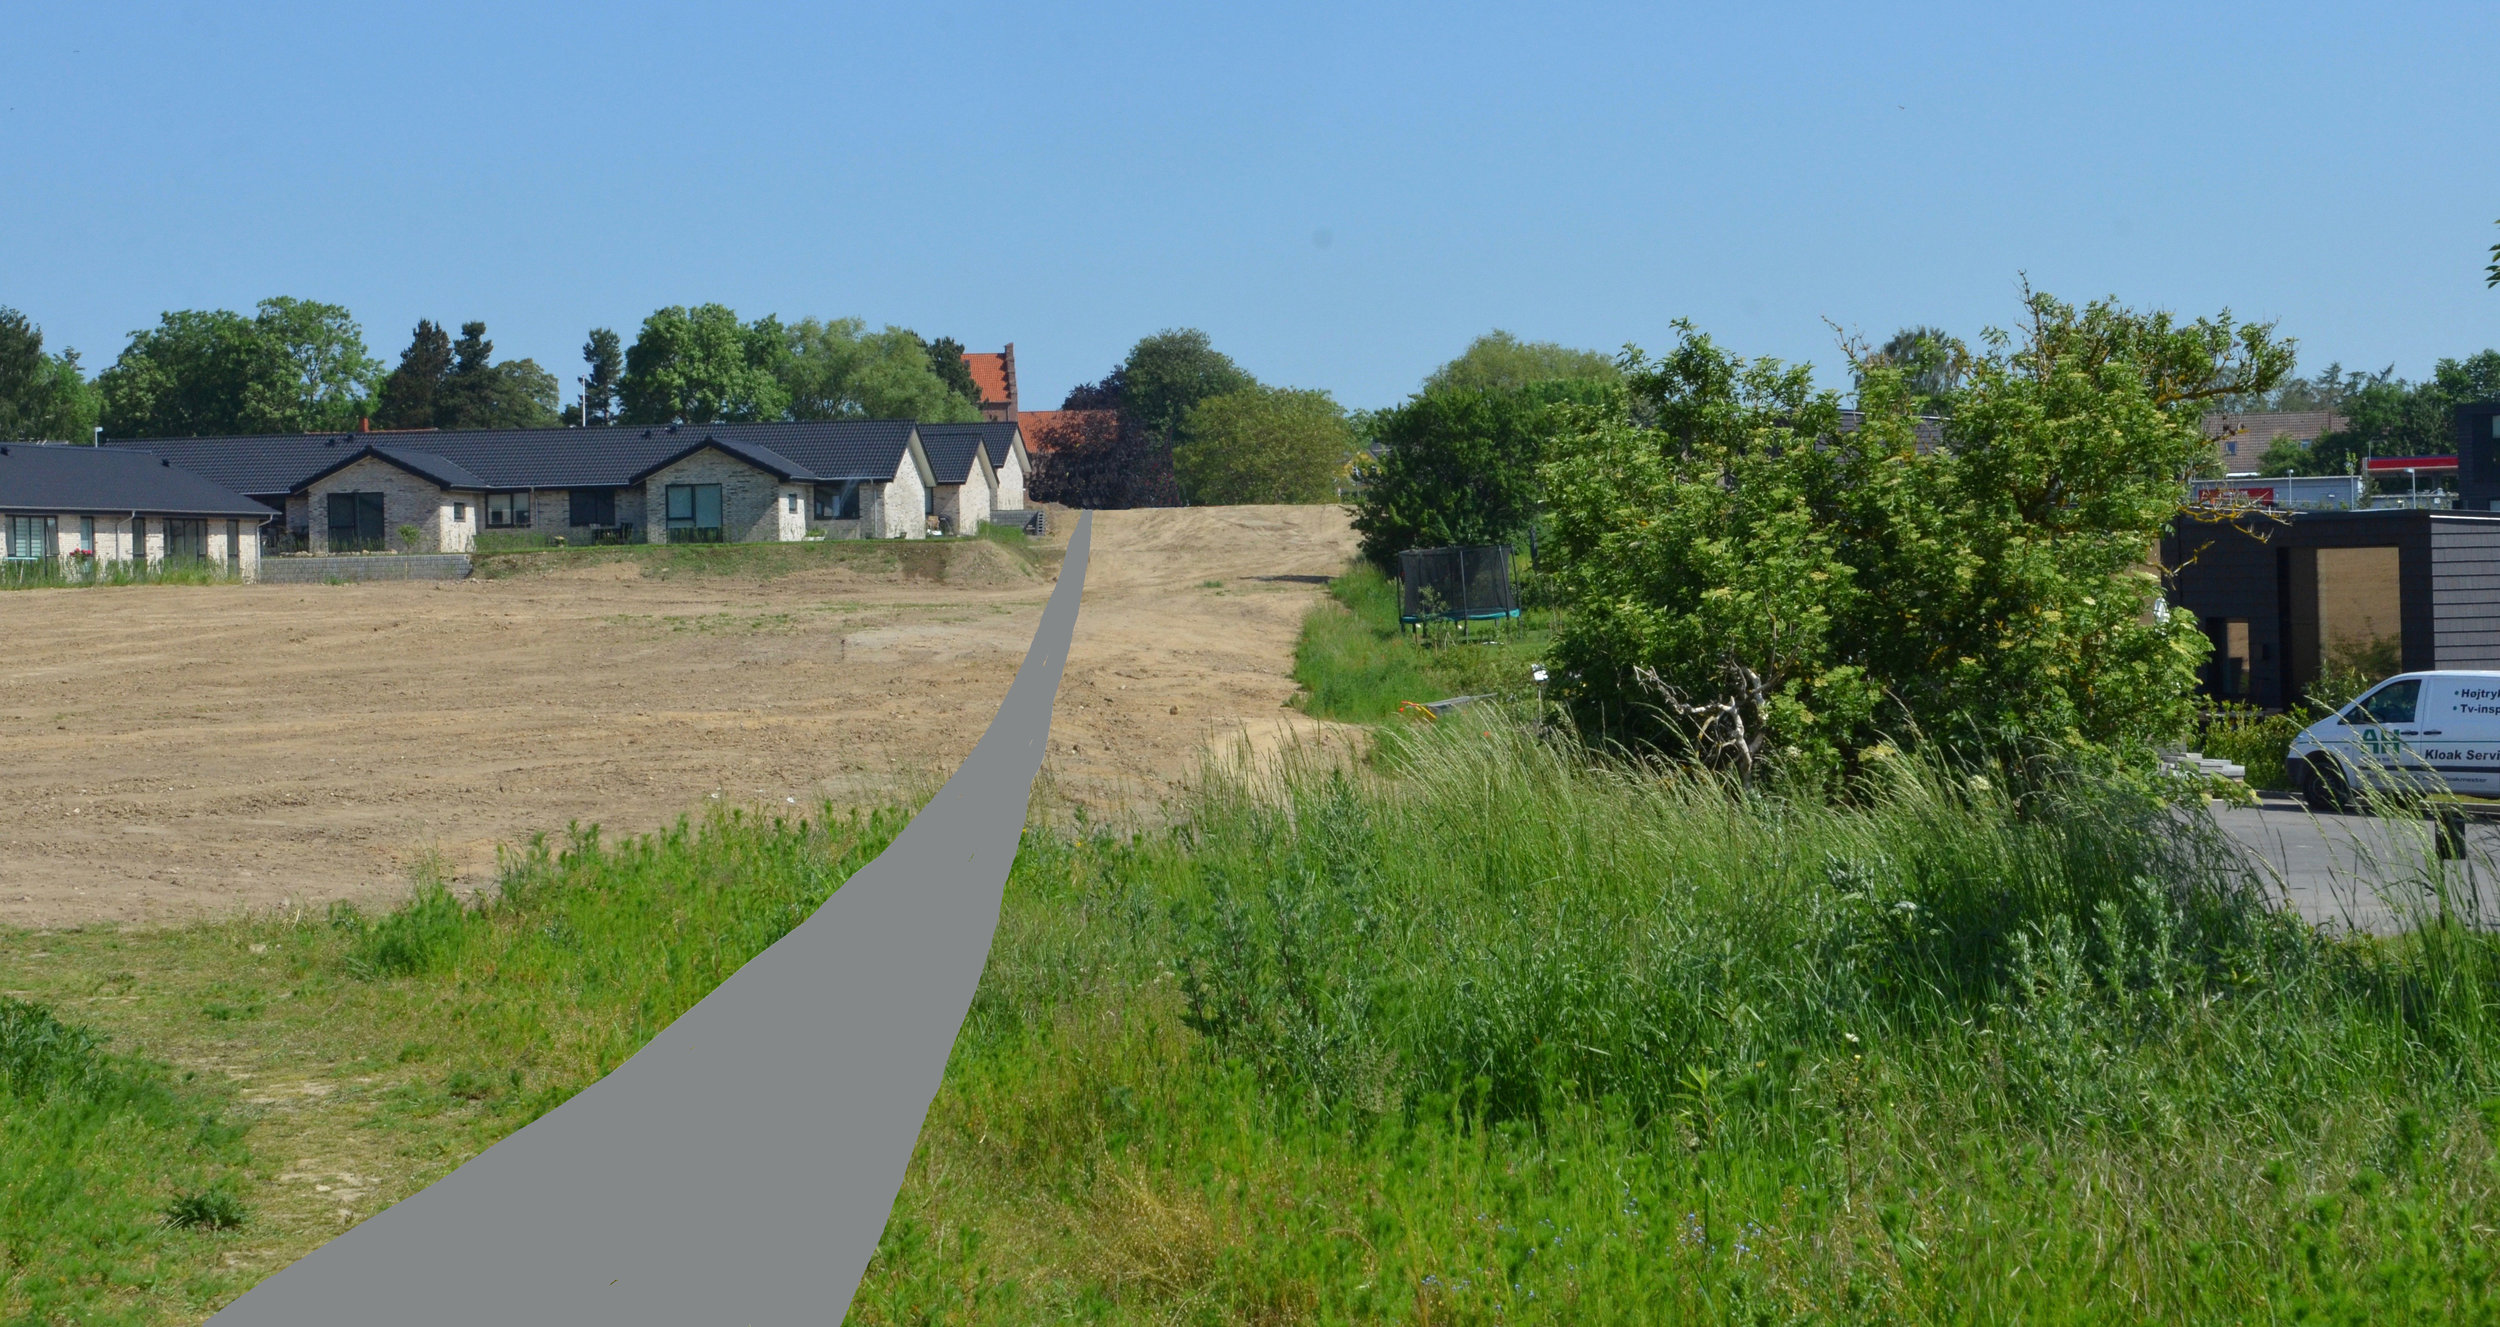 Skitsen viser Kirkestiens fremtidige forløb fra Kongevejen og ned i dalen - forbi det fremtidige brede grønne areal. Illustration: AOB